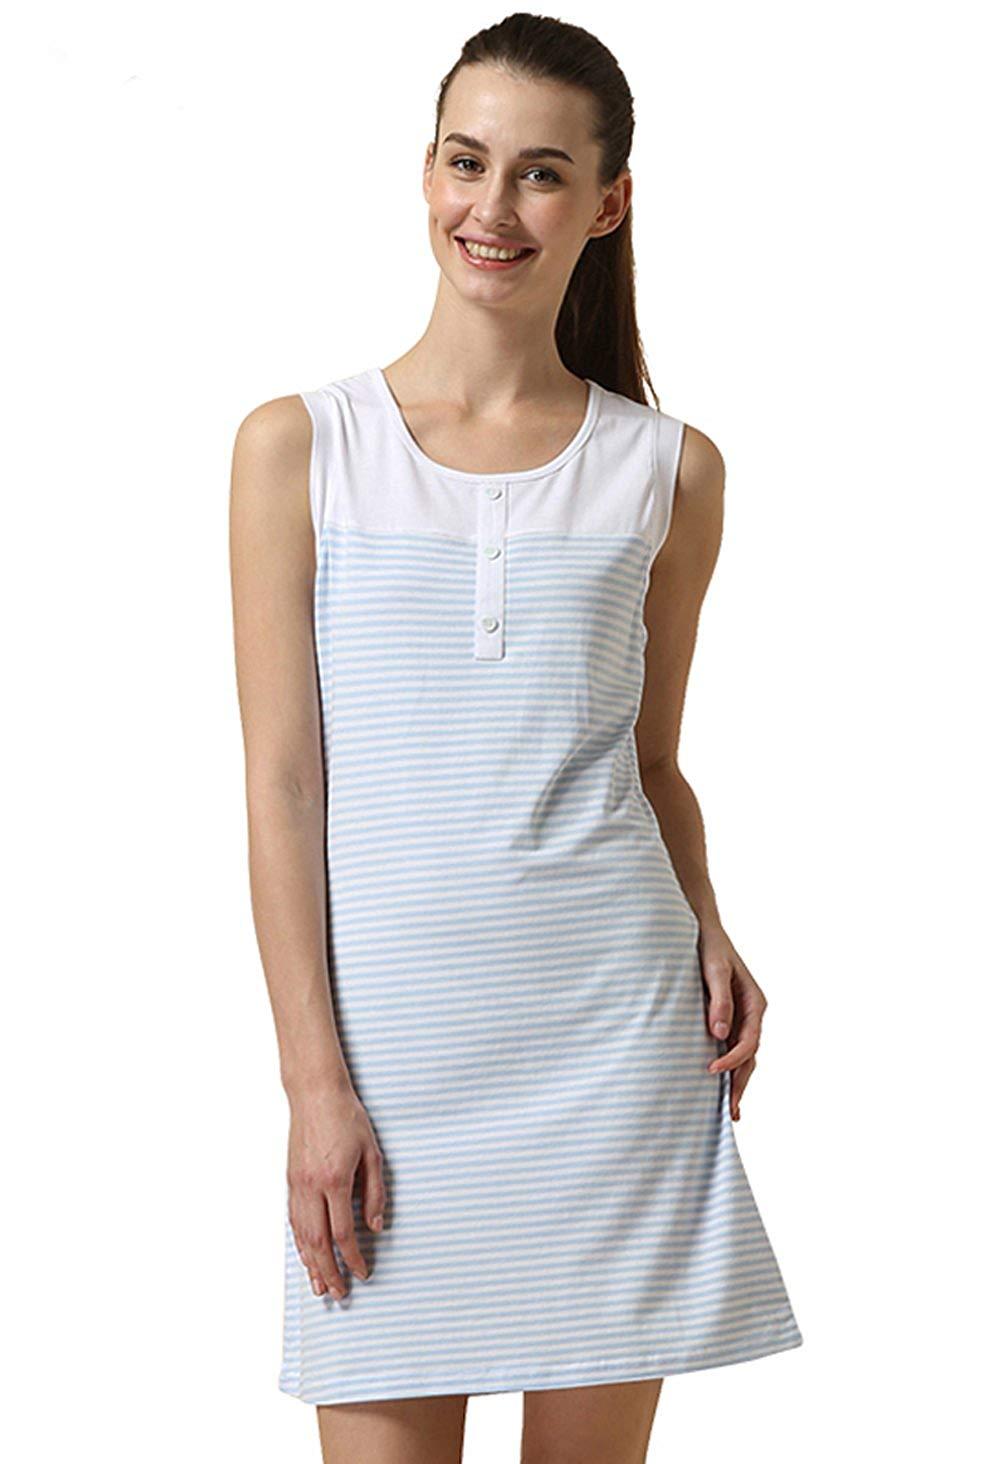 lady olga Poly Cotton Sleeveless Nightdress Summer 24317